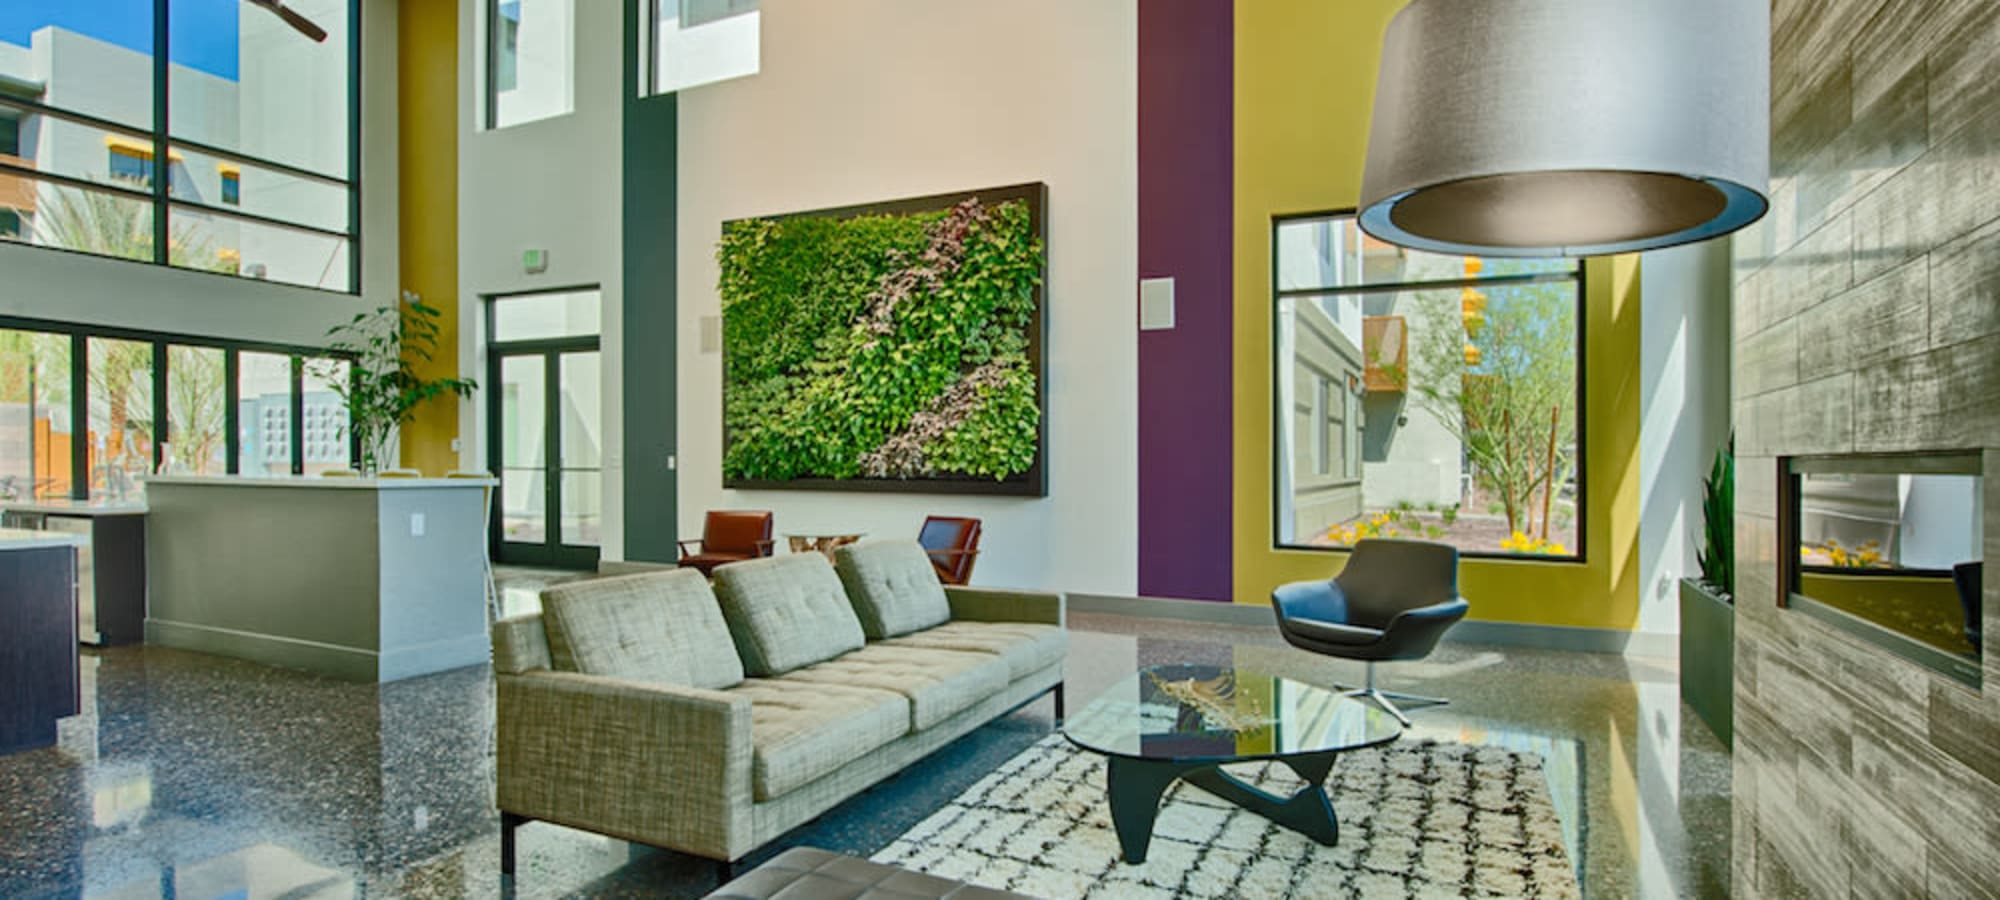 Lobby interior at Cactus Forty-2 in Phoenix, Arizona